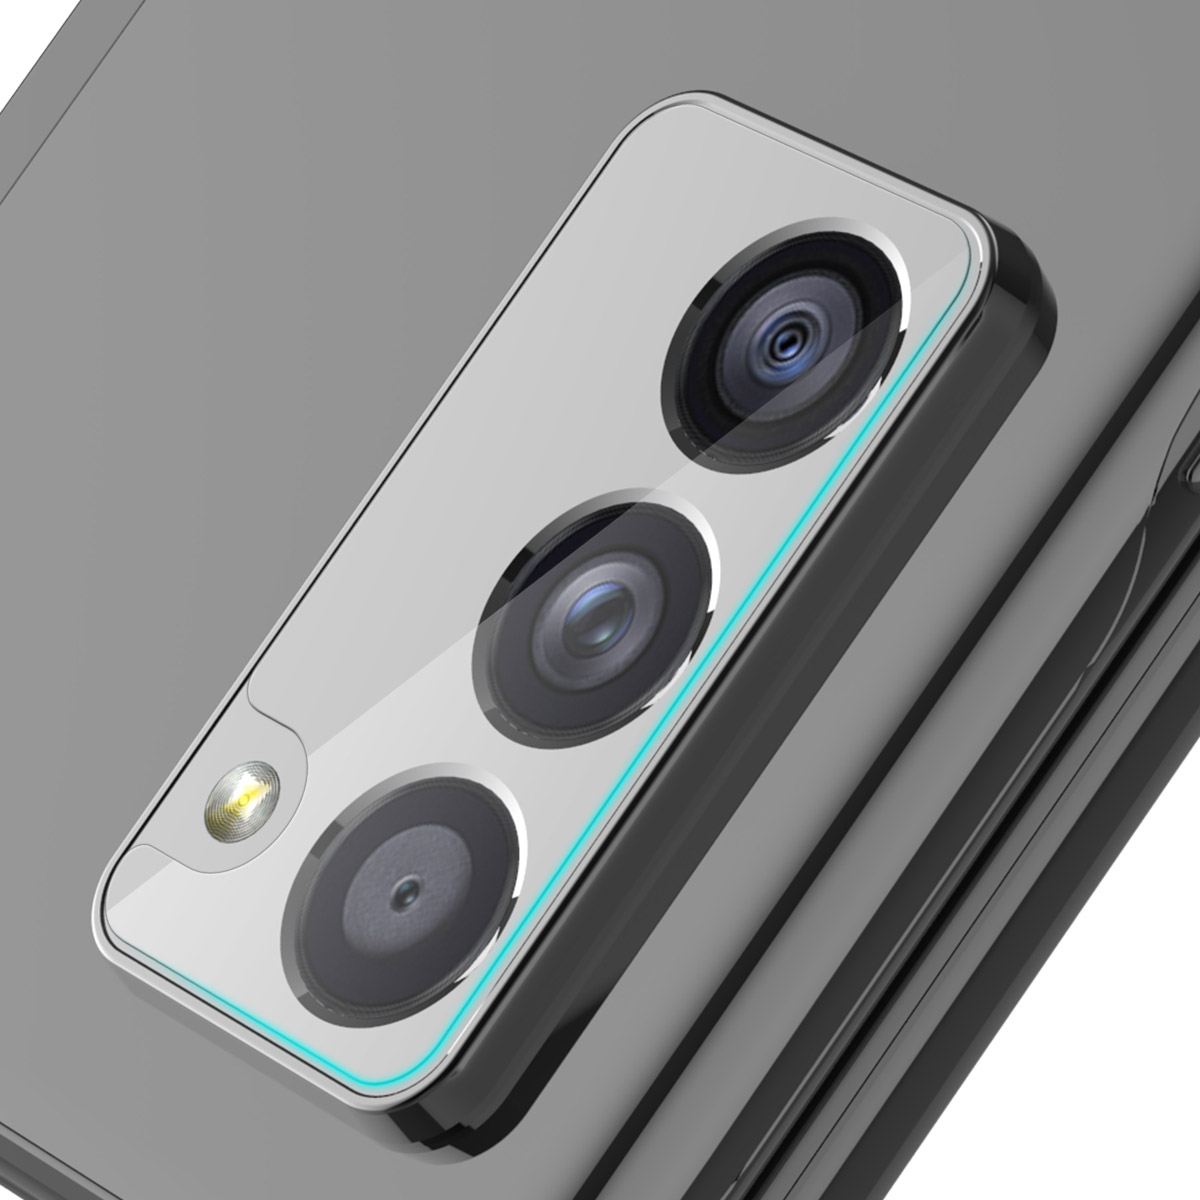 araree C-SUB CORE【Galaxy Z Fold2 5G カメラ専用 強化ガラスフィルム】 硬度9H スクラッチ防止 ガラスフィルム SCG05